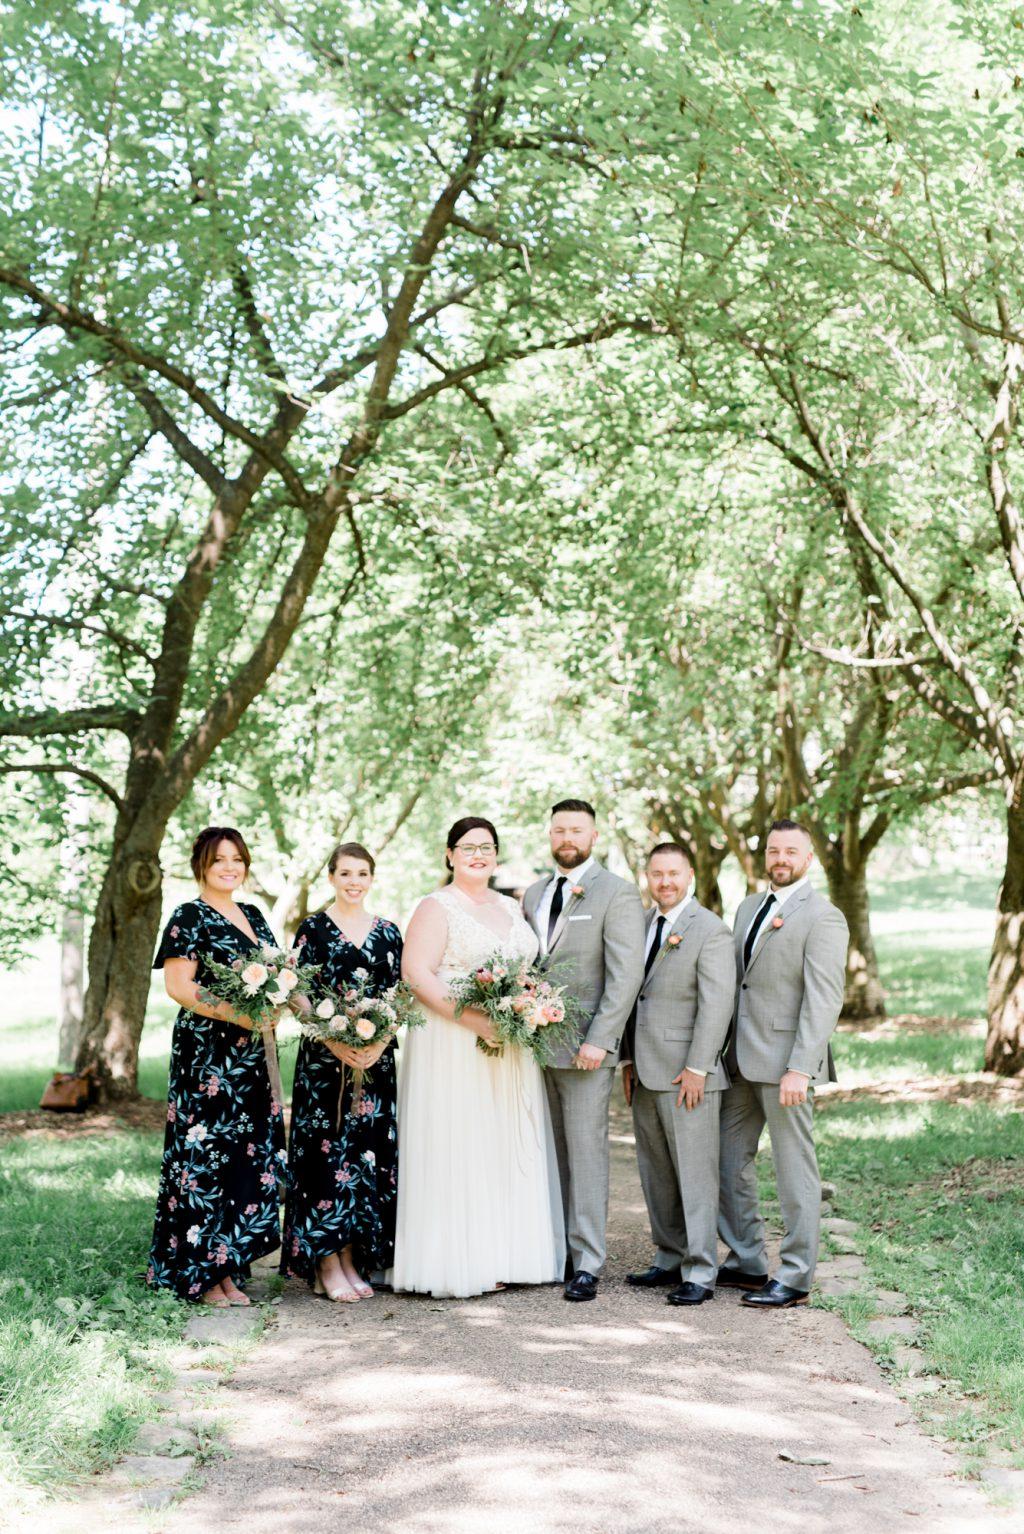 haley-richter-photo-west-chester-summer-wedding-boxcar-brewery-044